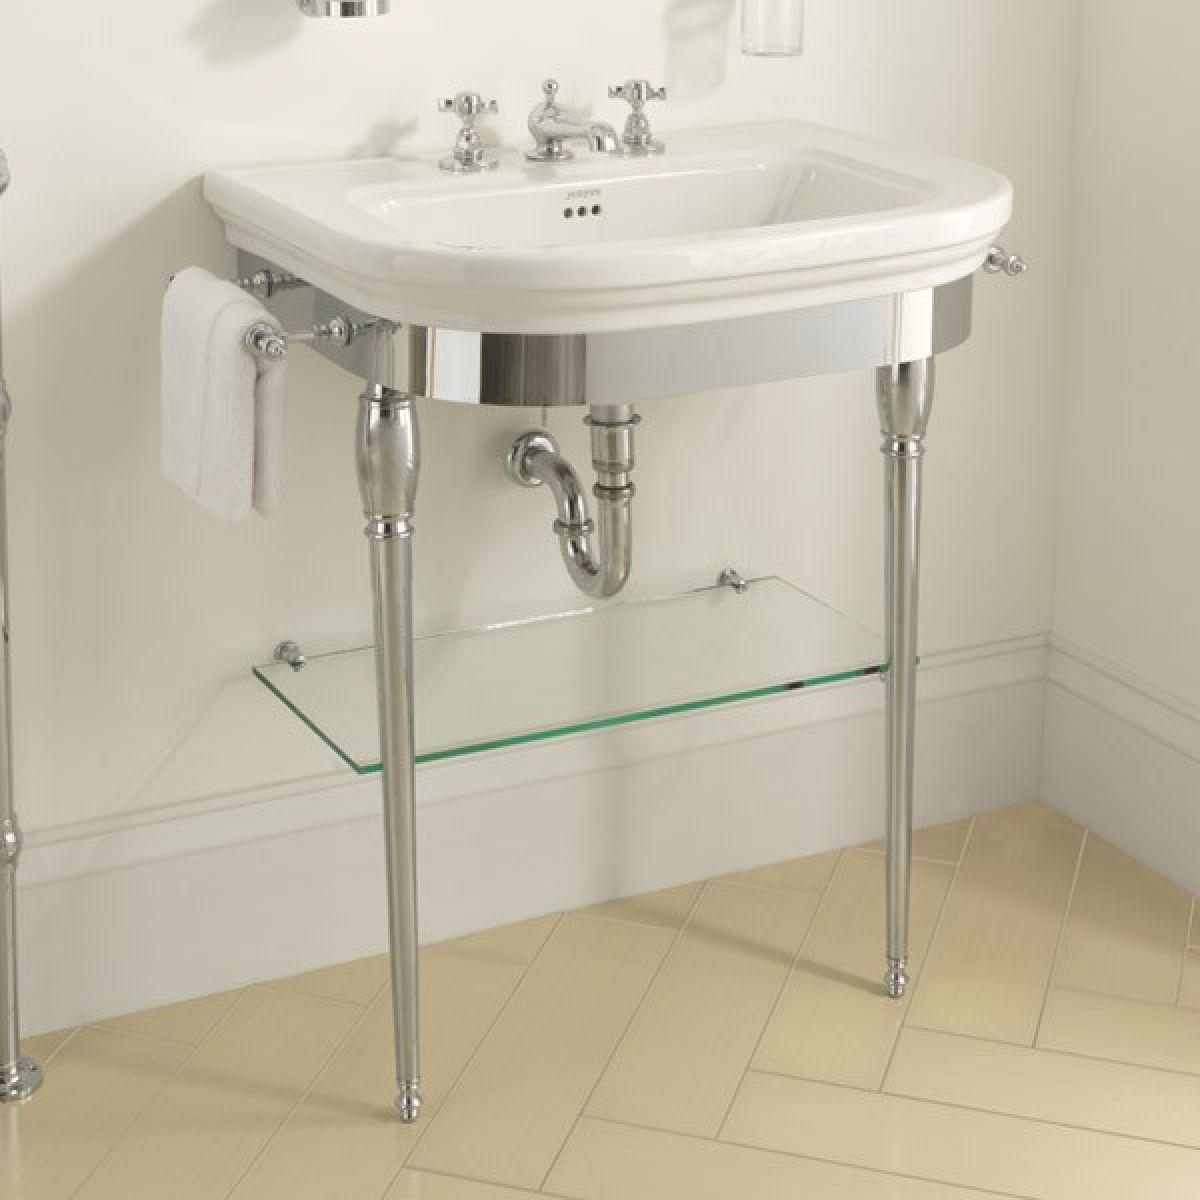 Designs Ideas Using Bathroom Sinks